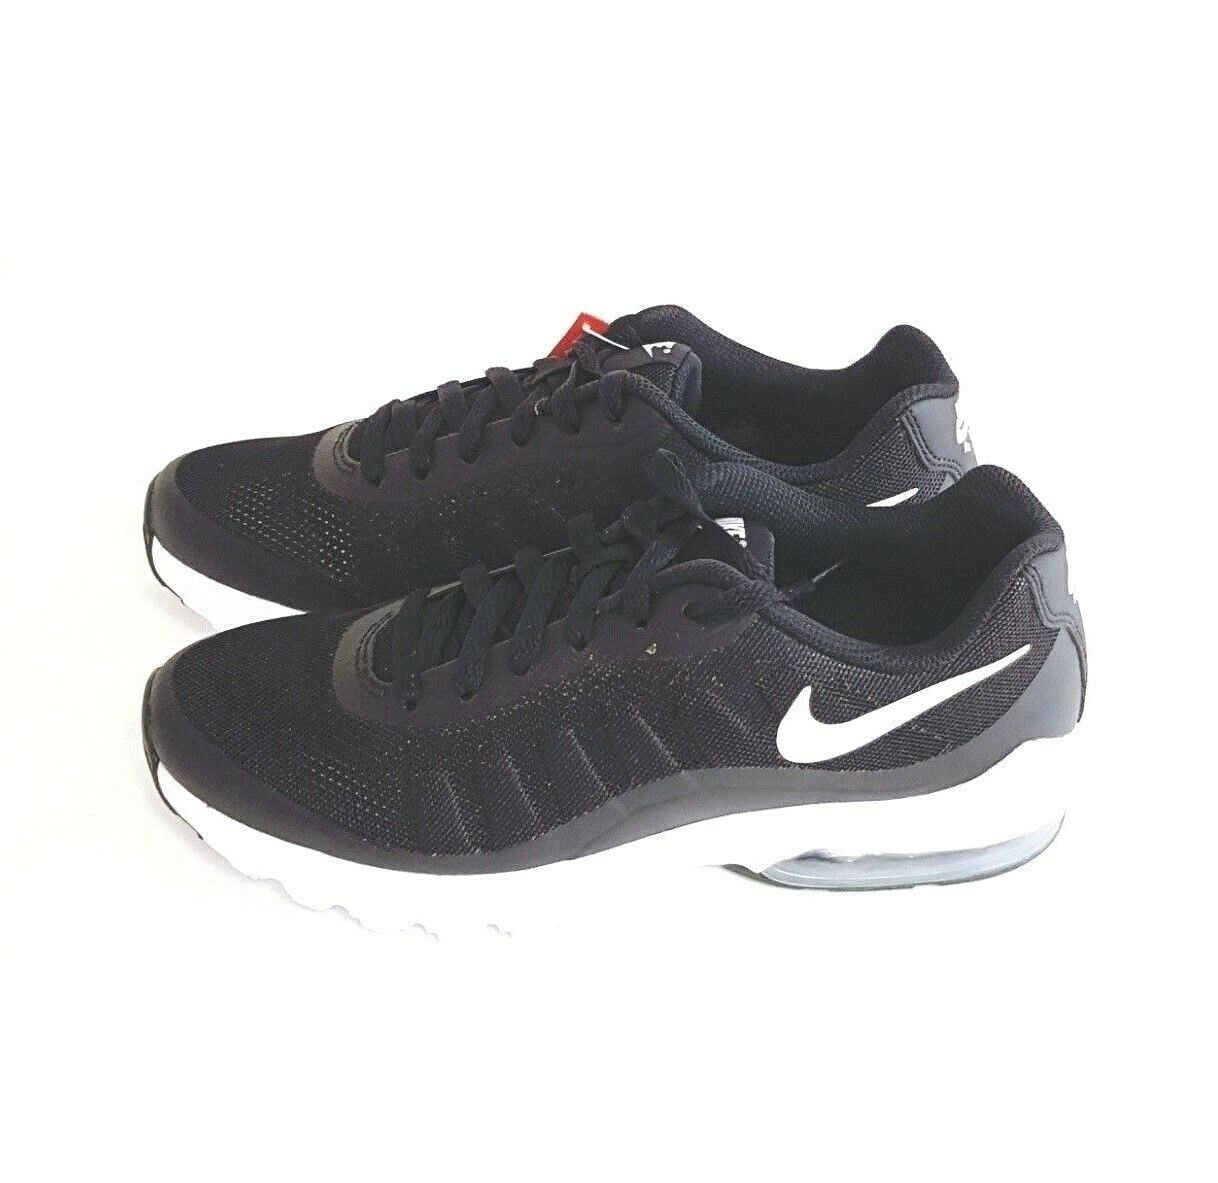 Brand New 749680-010 NIKE AIR MAX INVIGOR Black shoes Sneakers US M 7.5 9 9.5 10